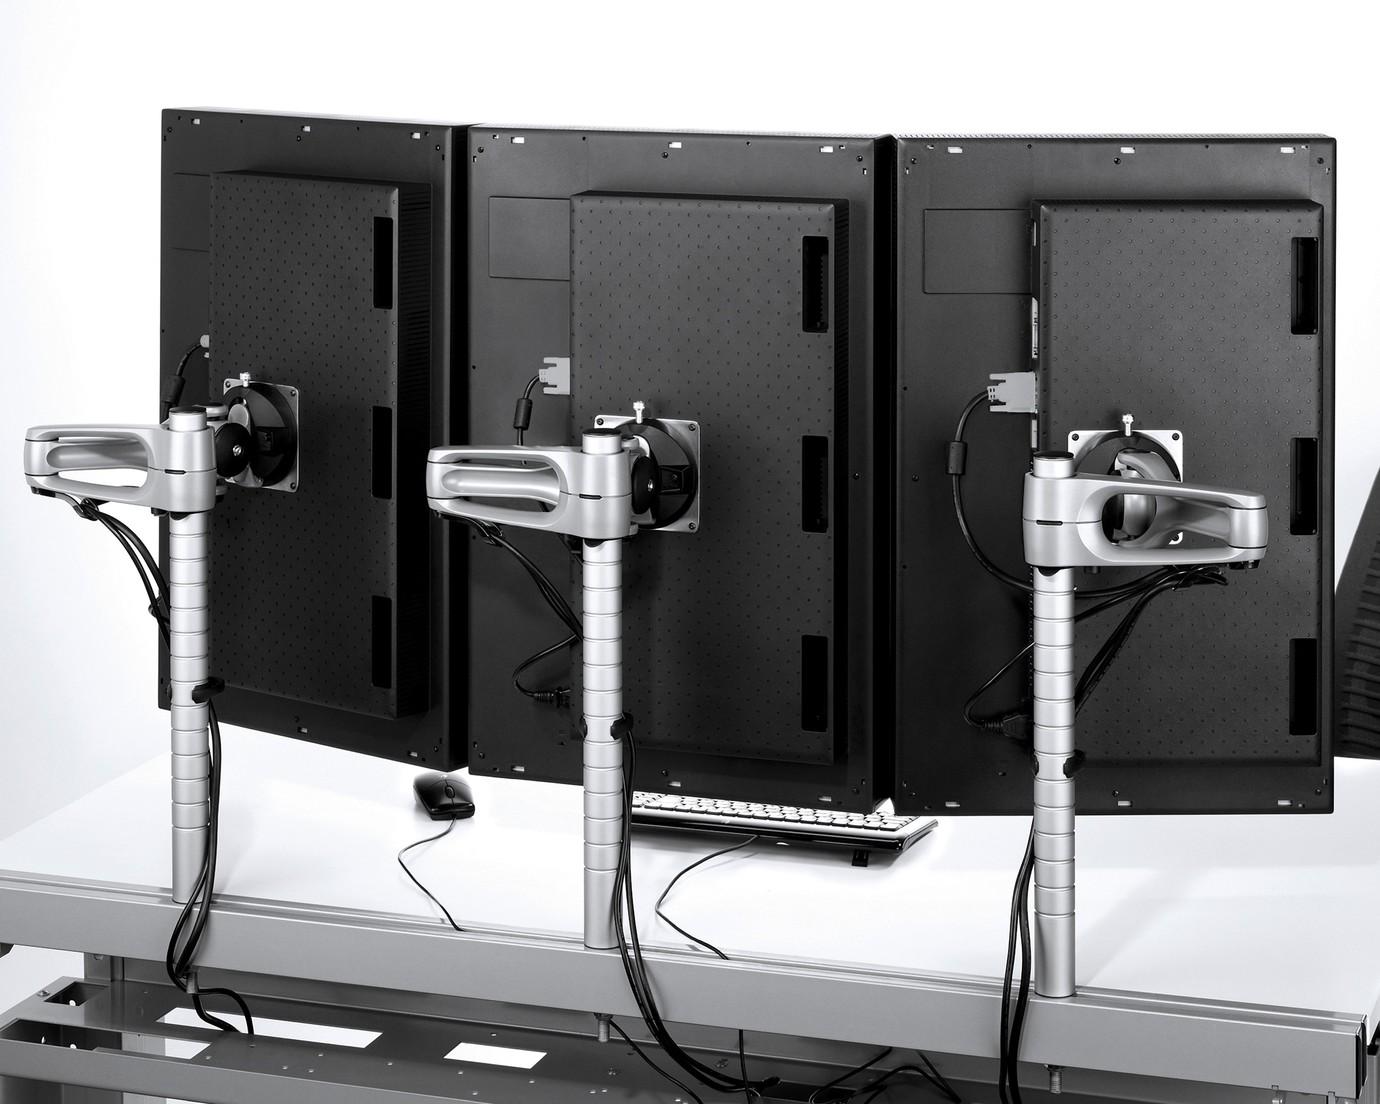 10-Equipamiento-Soporte-Monitor-Wishbone-Ergonomico-1380